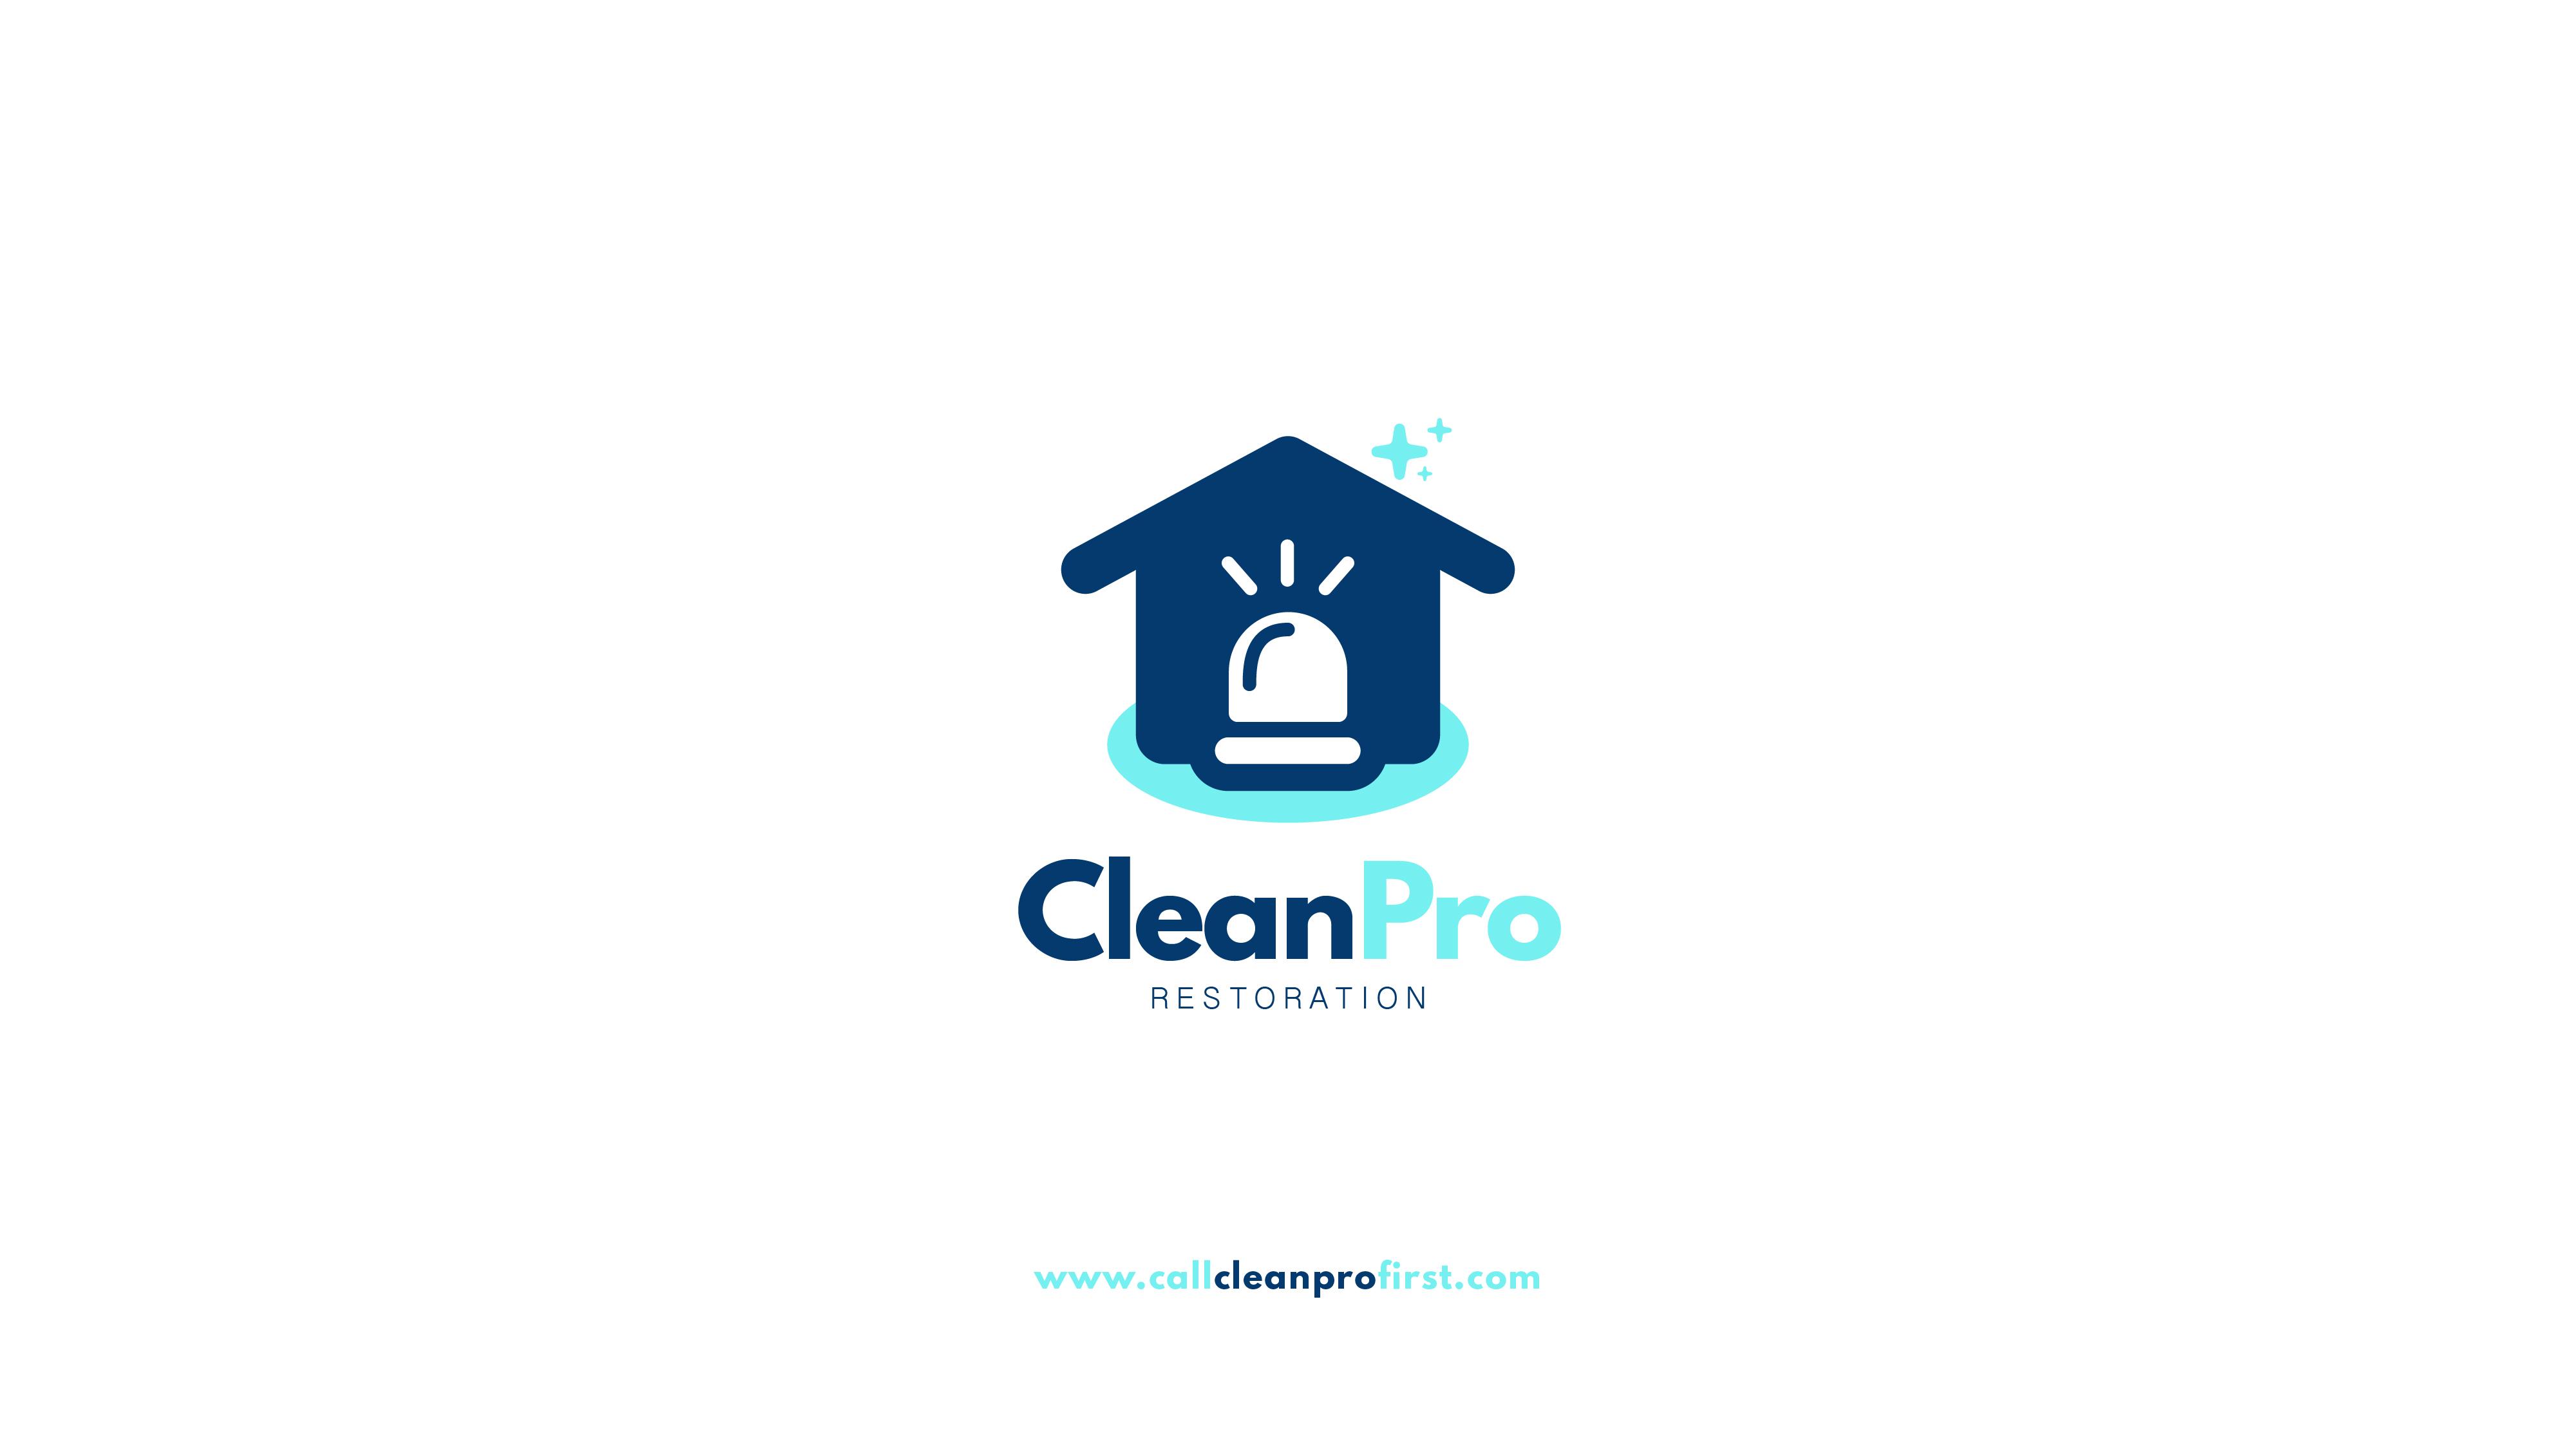 17_05_03_Presentacion_Clean_Pro_Restoration-10